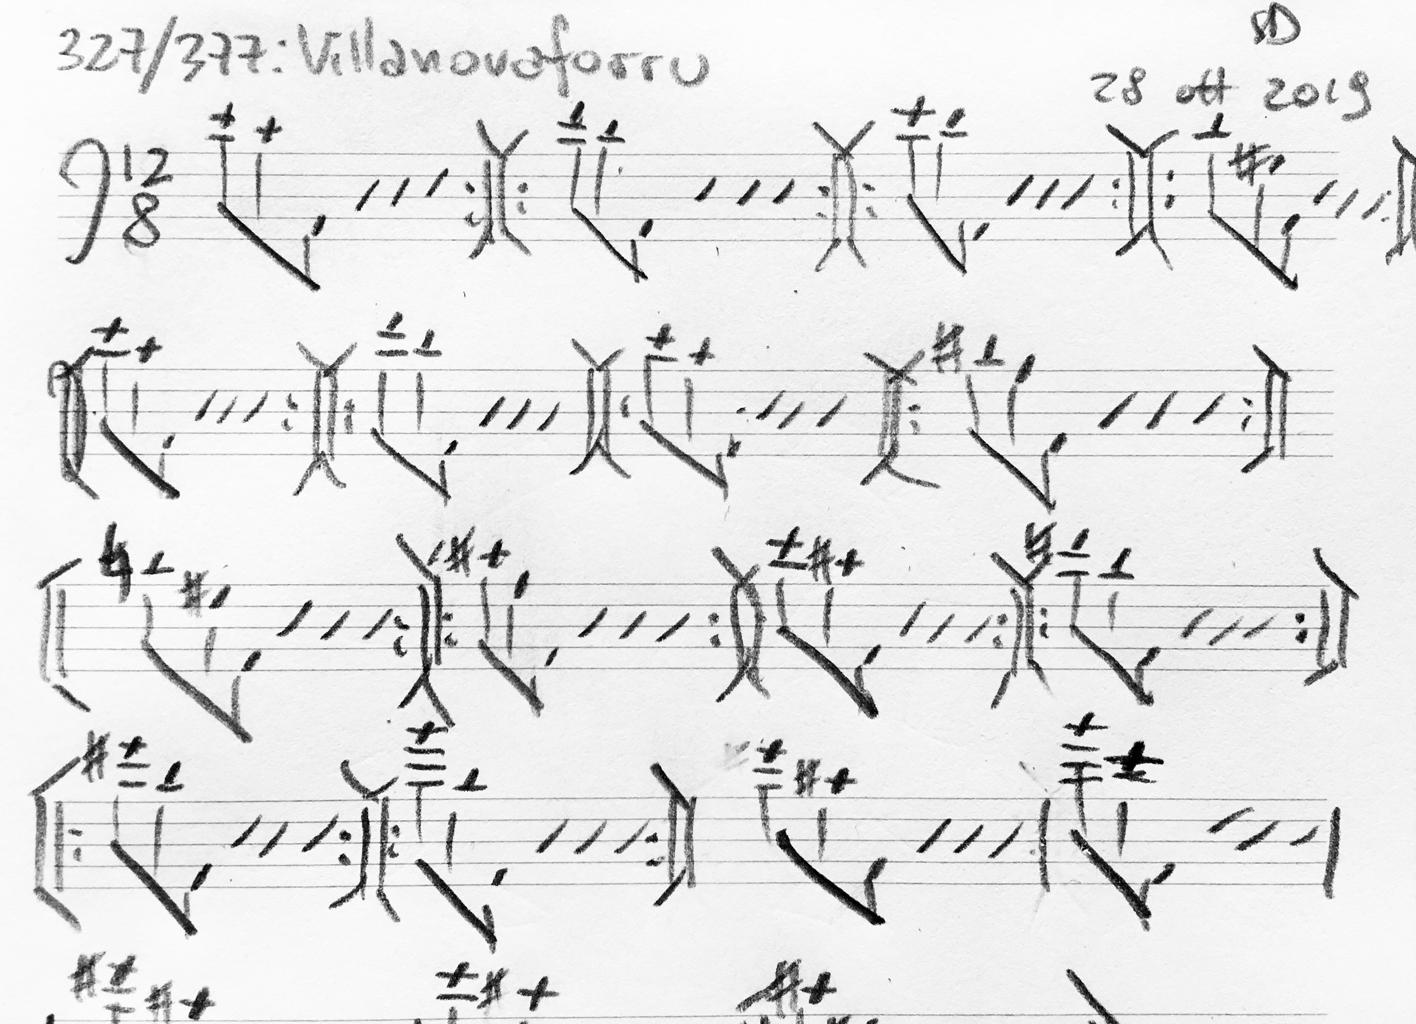 327-Villanovaforru-score